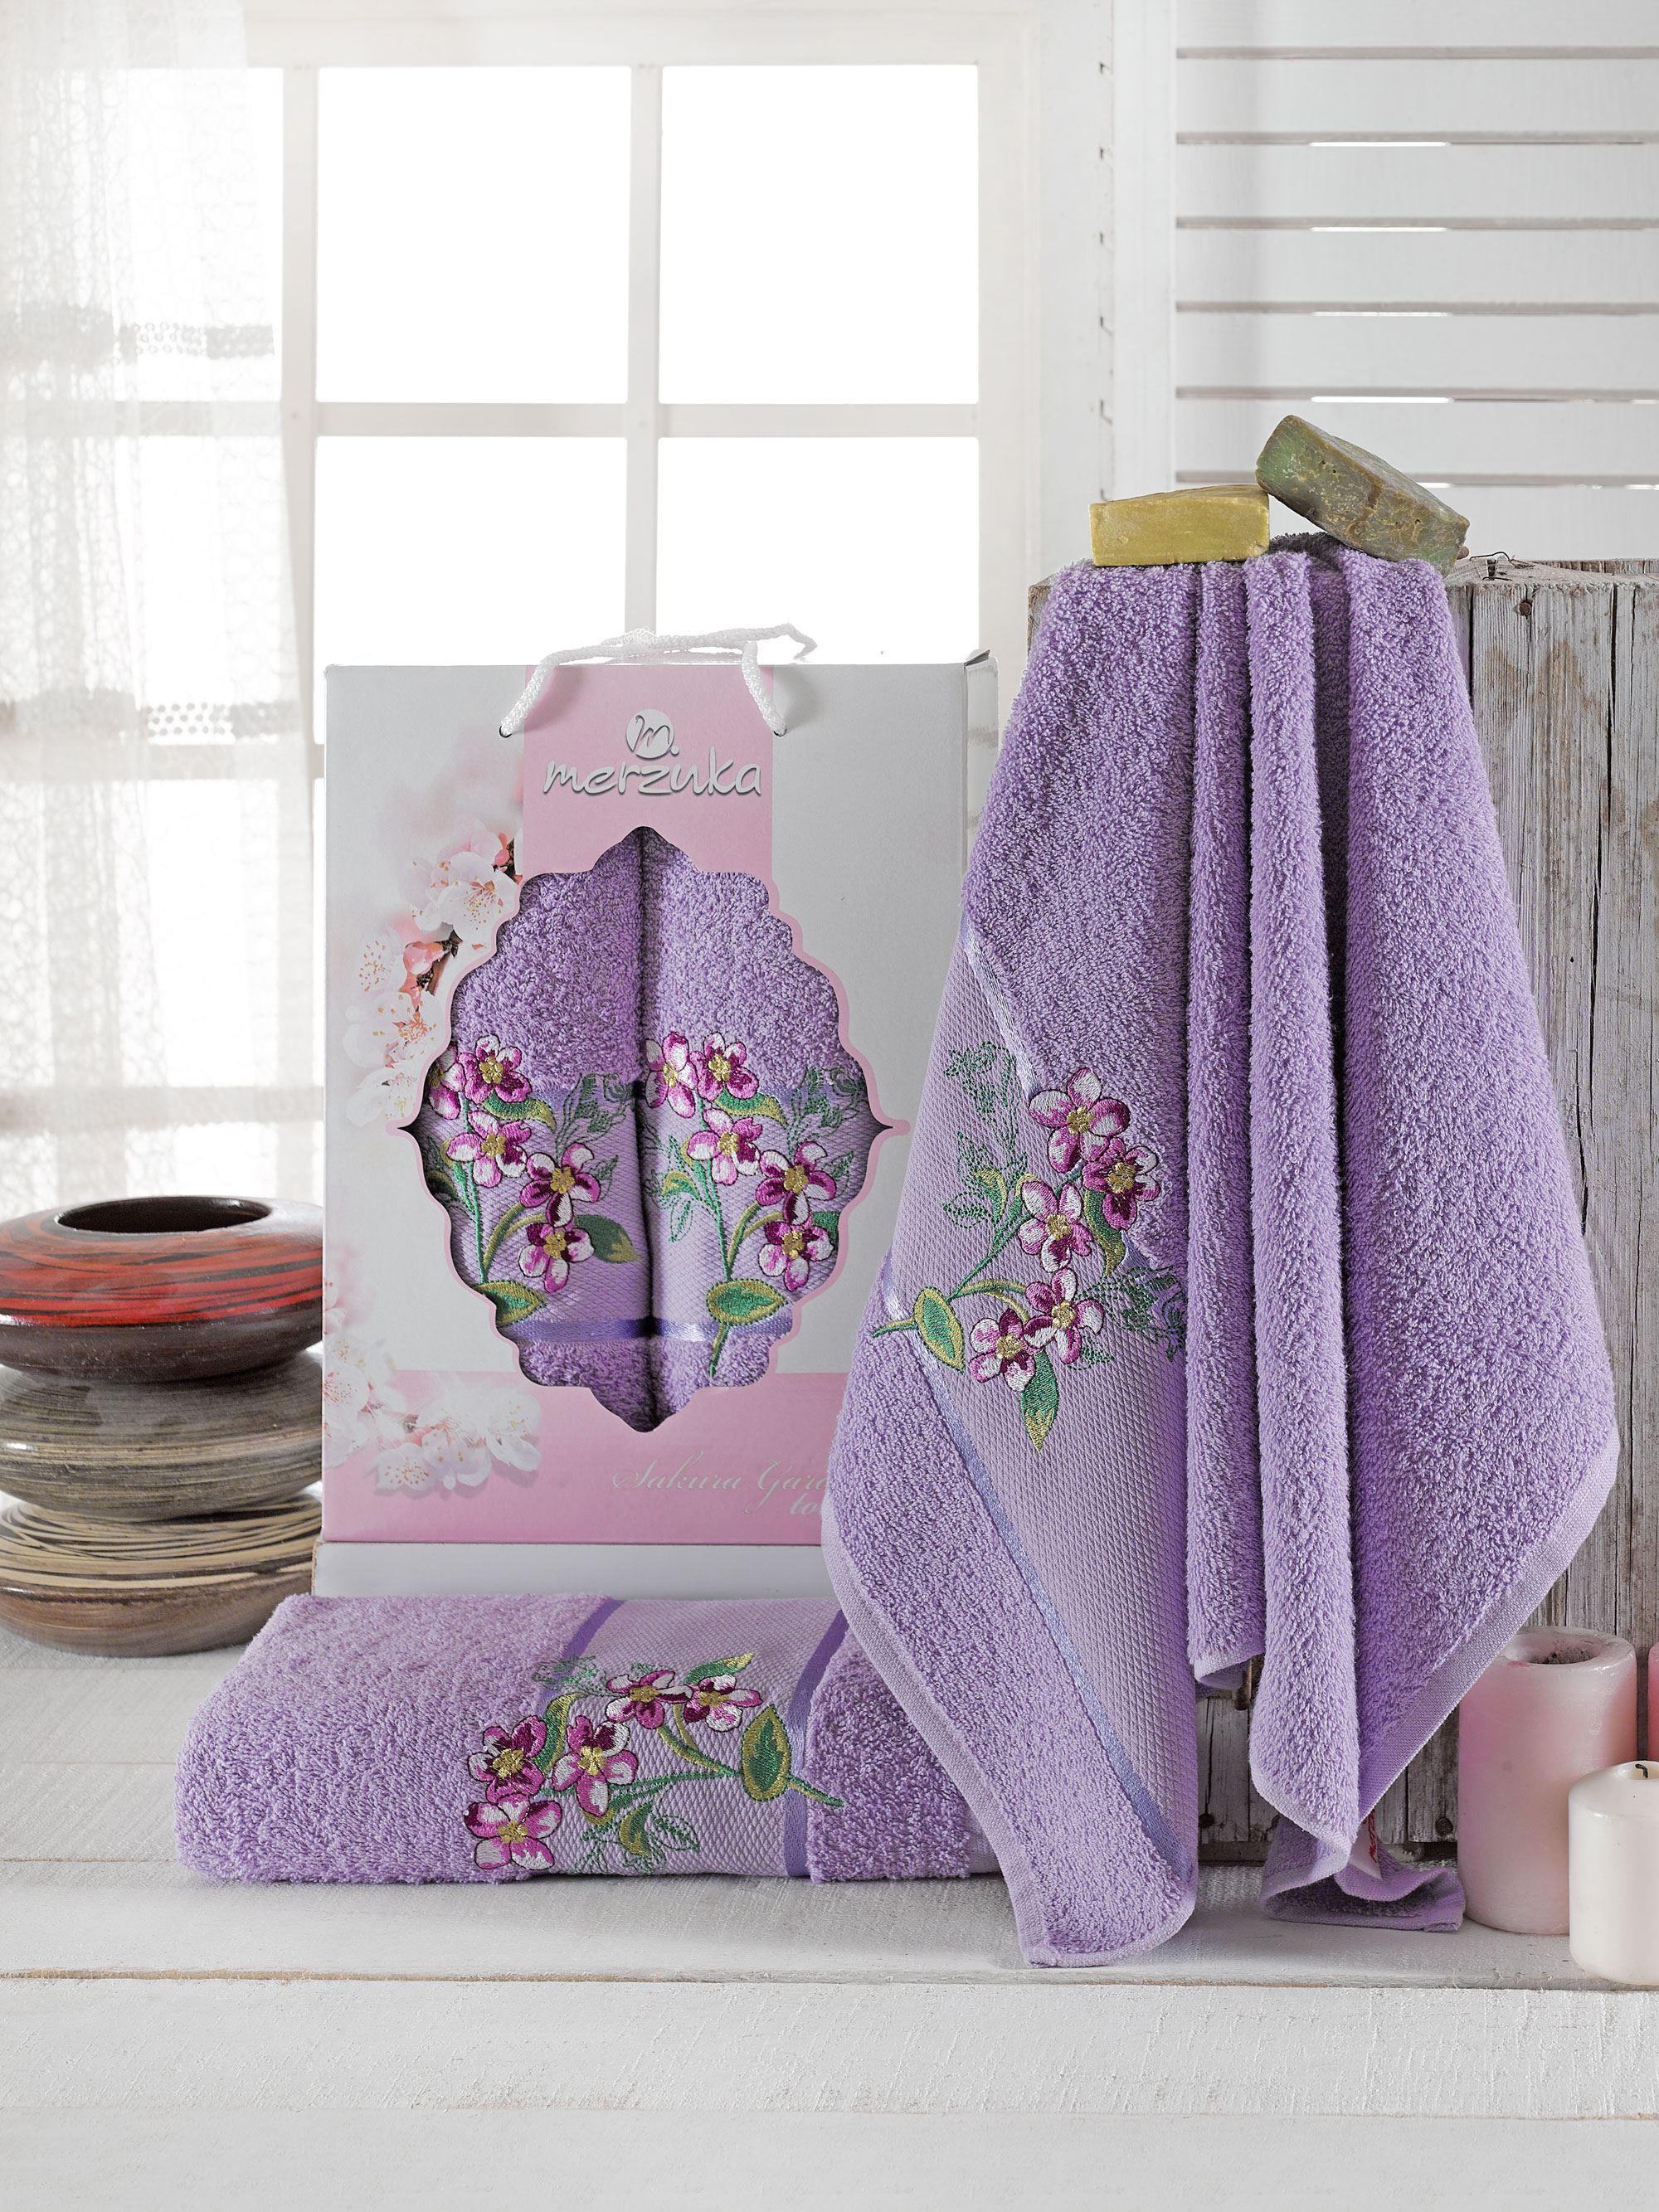 Полотенца Oran Merzuka Полотенце Sakura Garden Цвет: Лиловый (50х80 см,70х130 см) полотенца oran merzuka полотенце sakura цвет светло лиловый набор